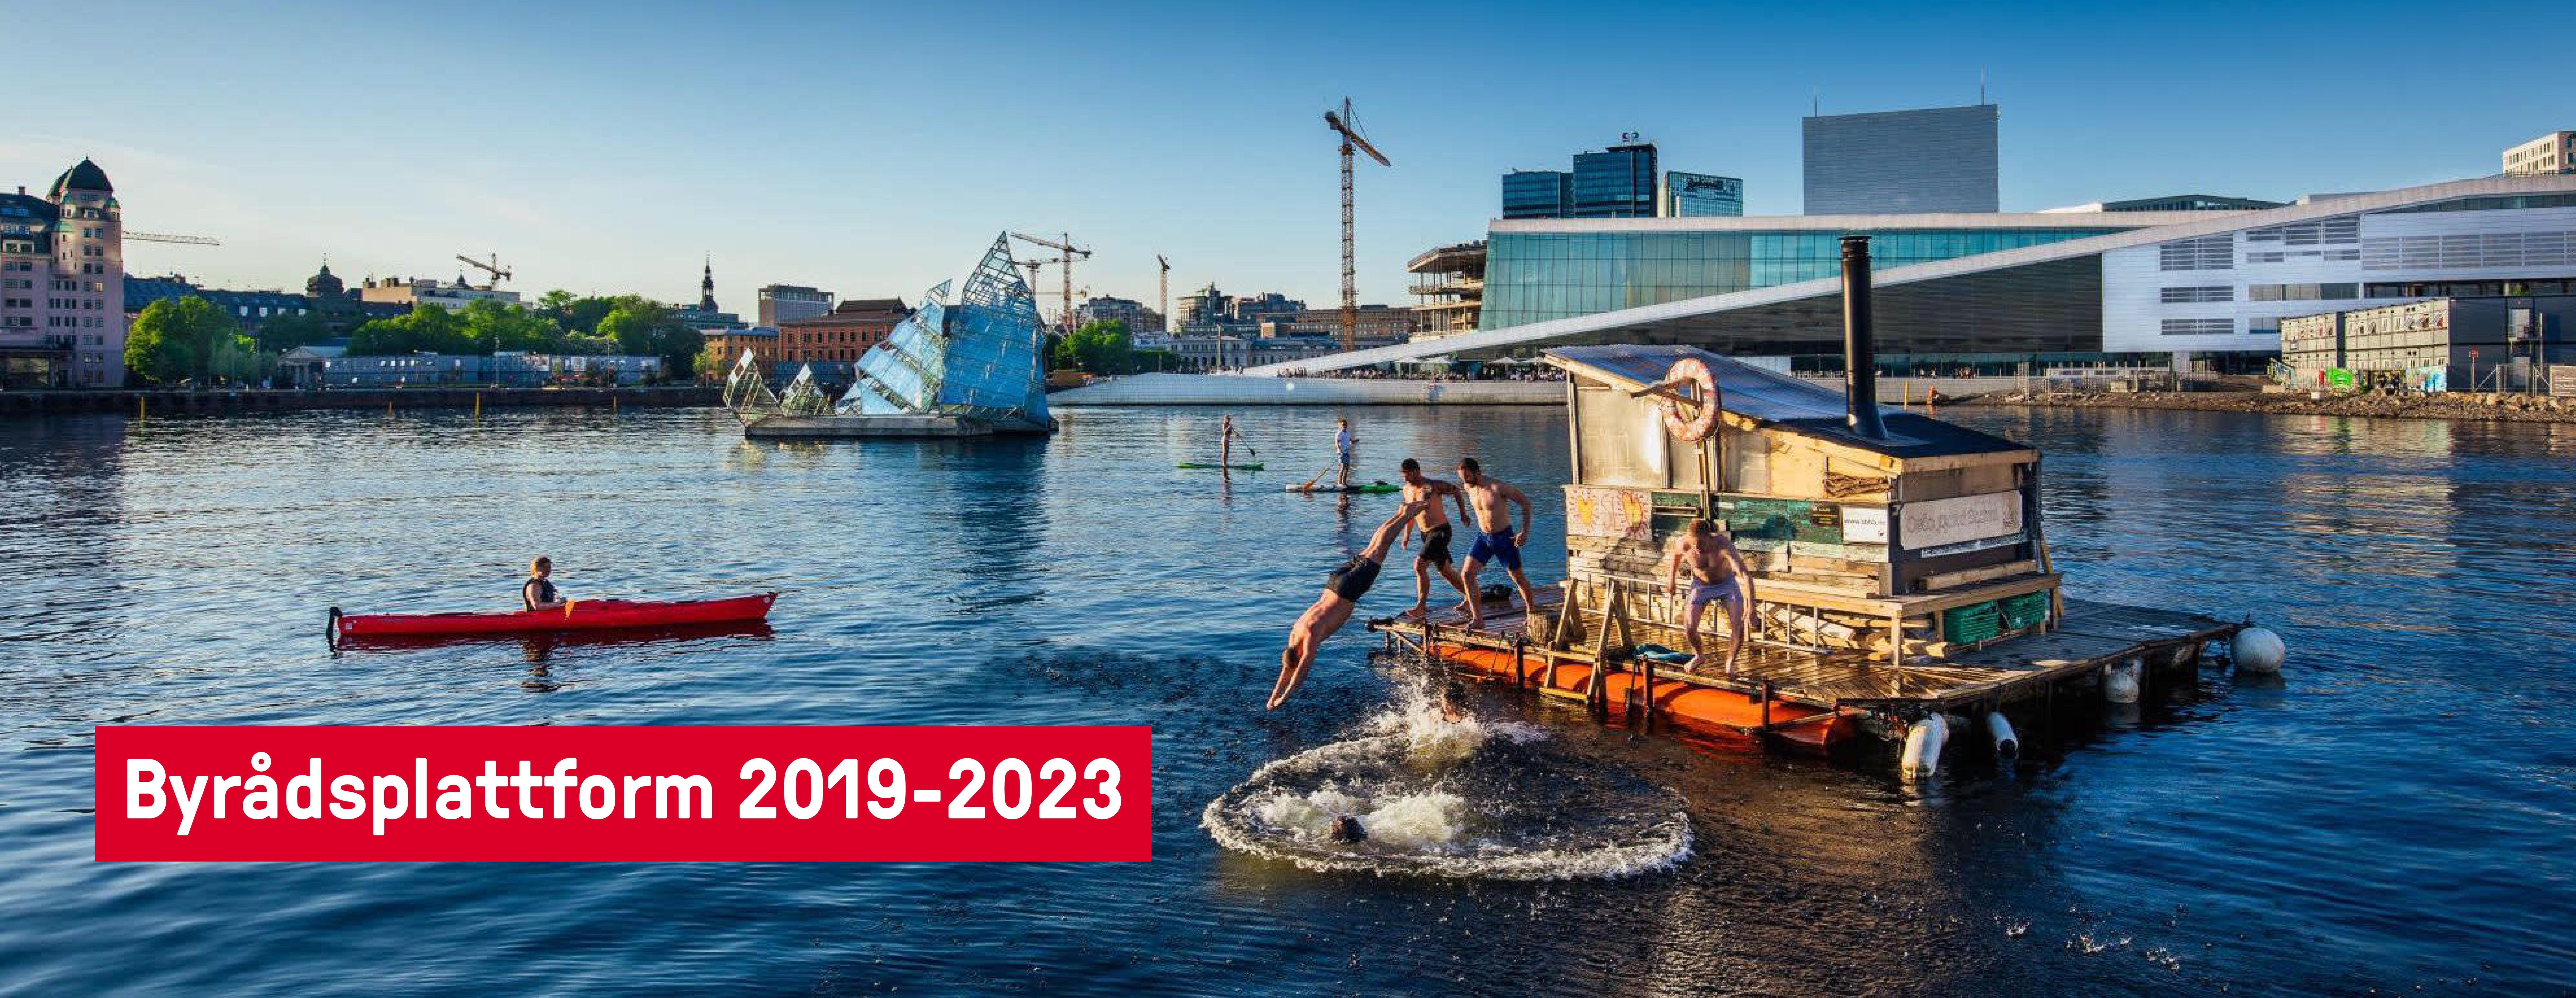 Byrådsplattform 2019-2023 (Foto: Geir Anders Rybakken Ørslien / UFGC19)